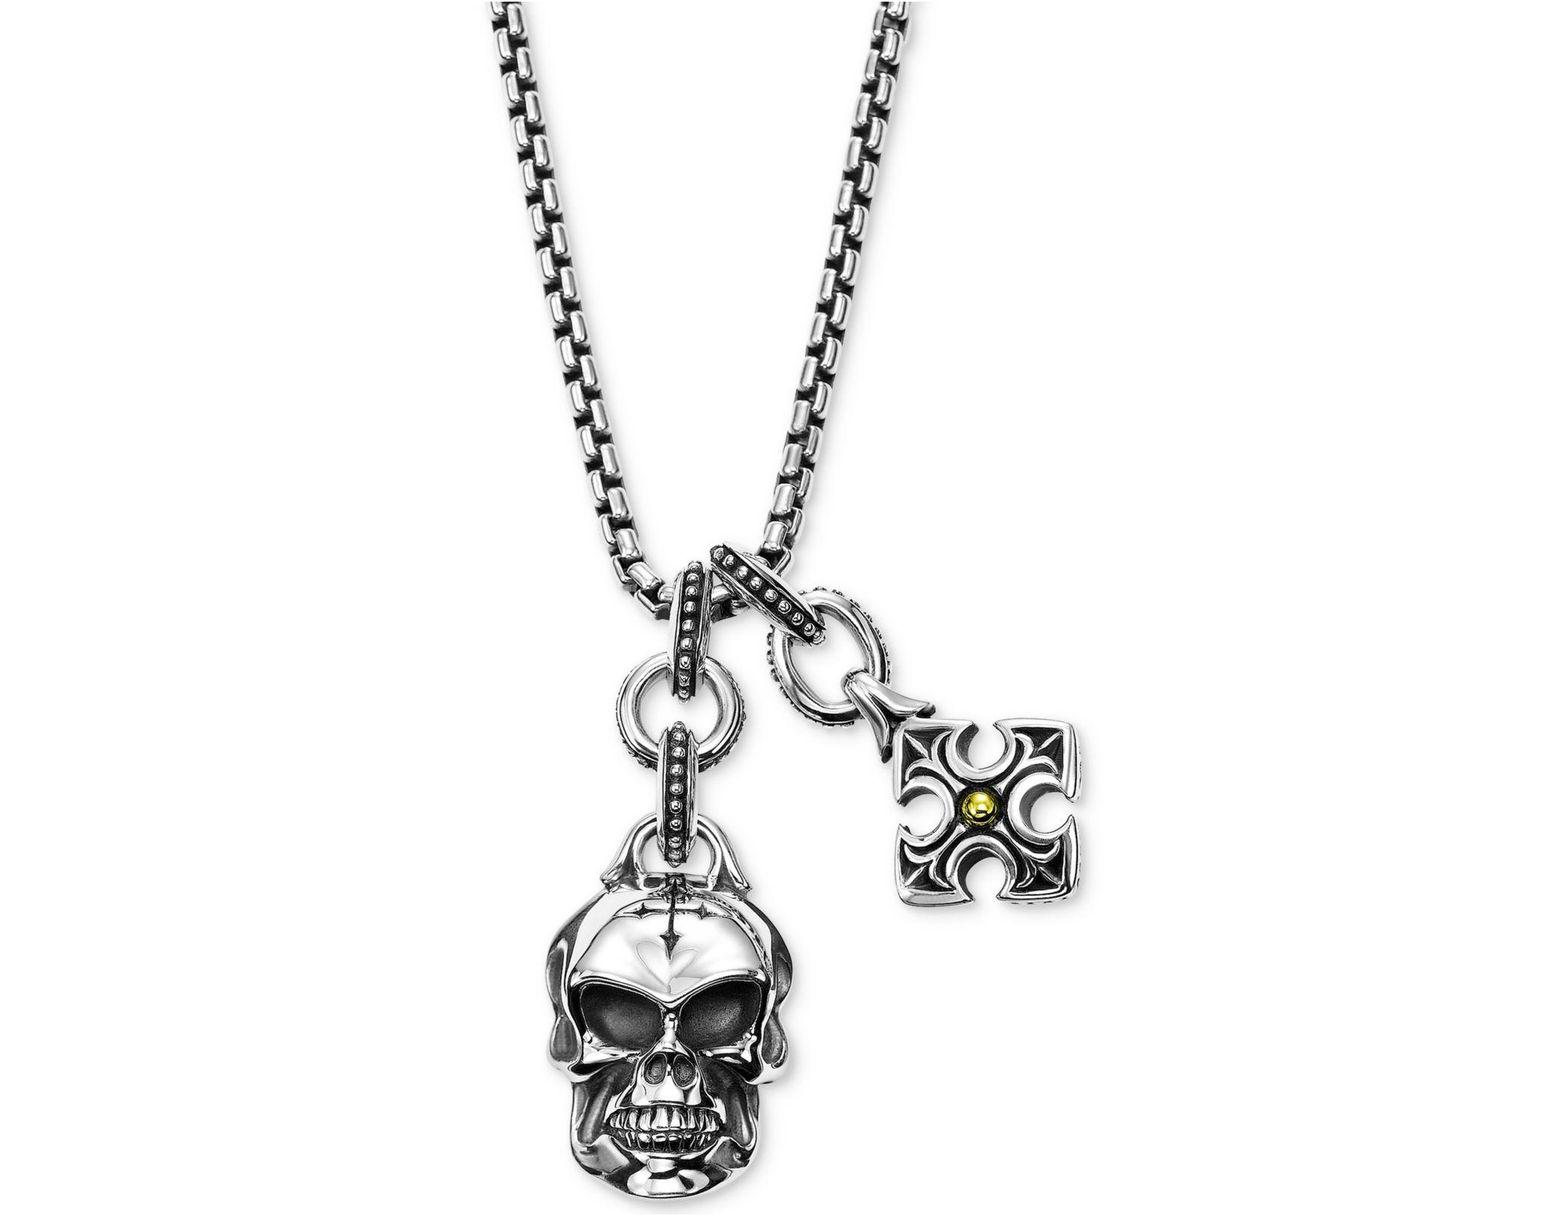 63149af31 Scott Kay Men's Multi-charm Pendant Necklace In Sterling Silver & 18k Gold  in Metallic - Lyst